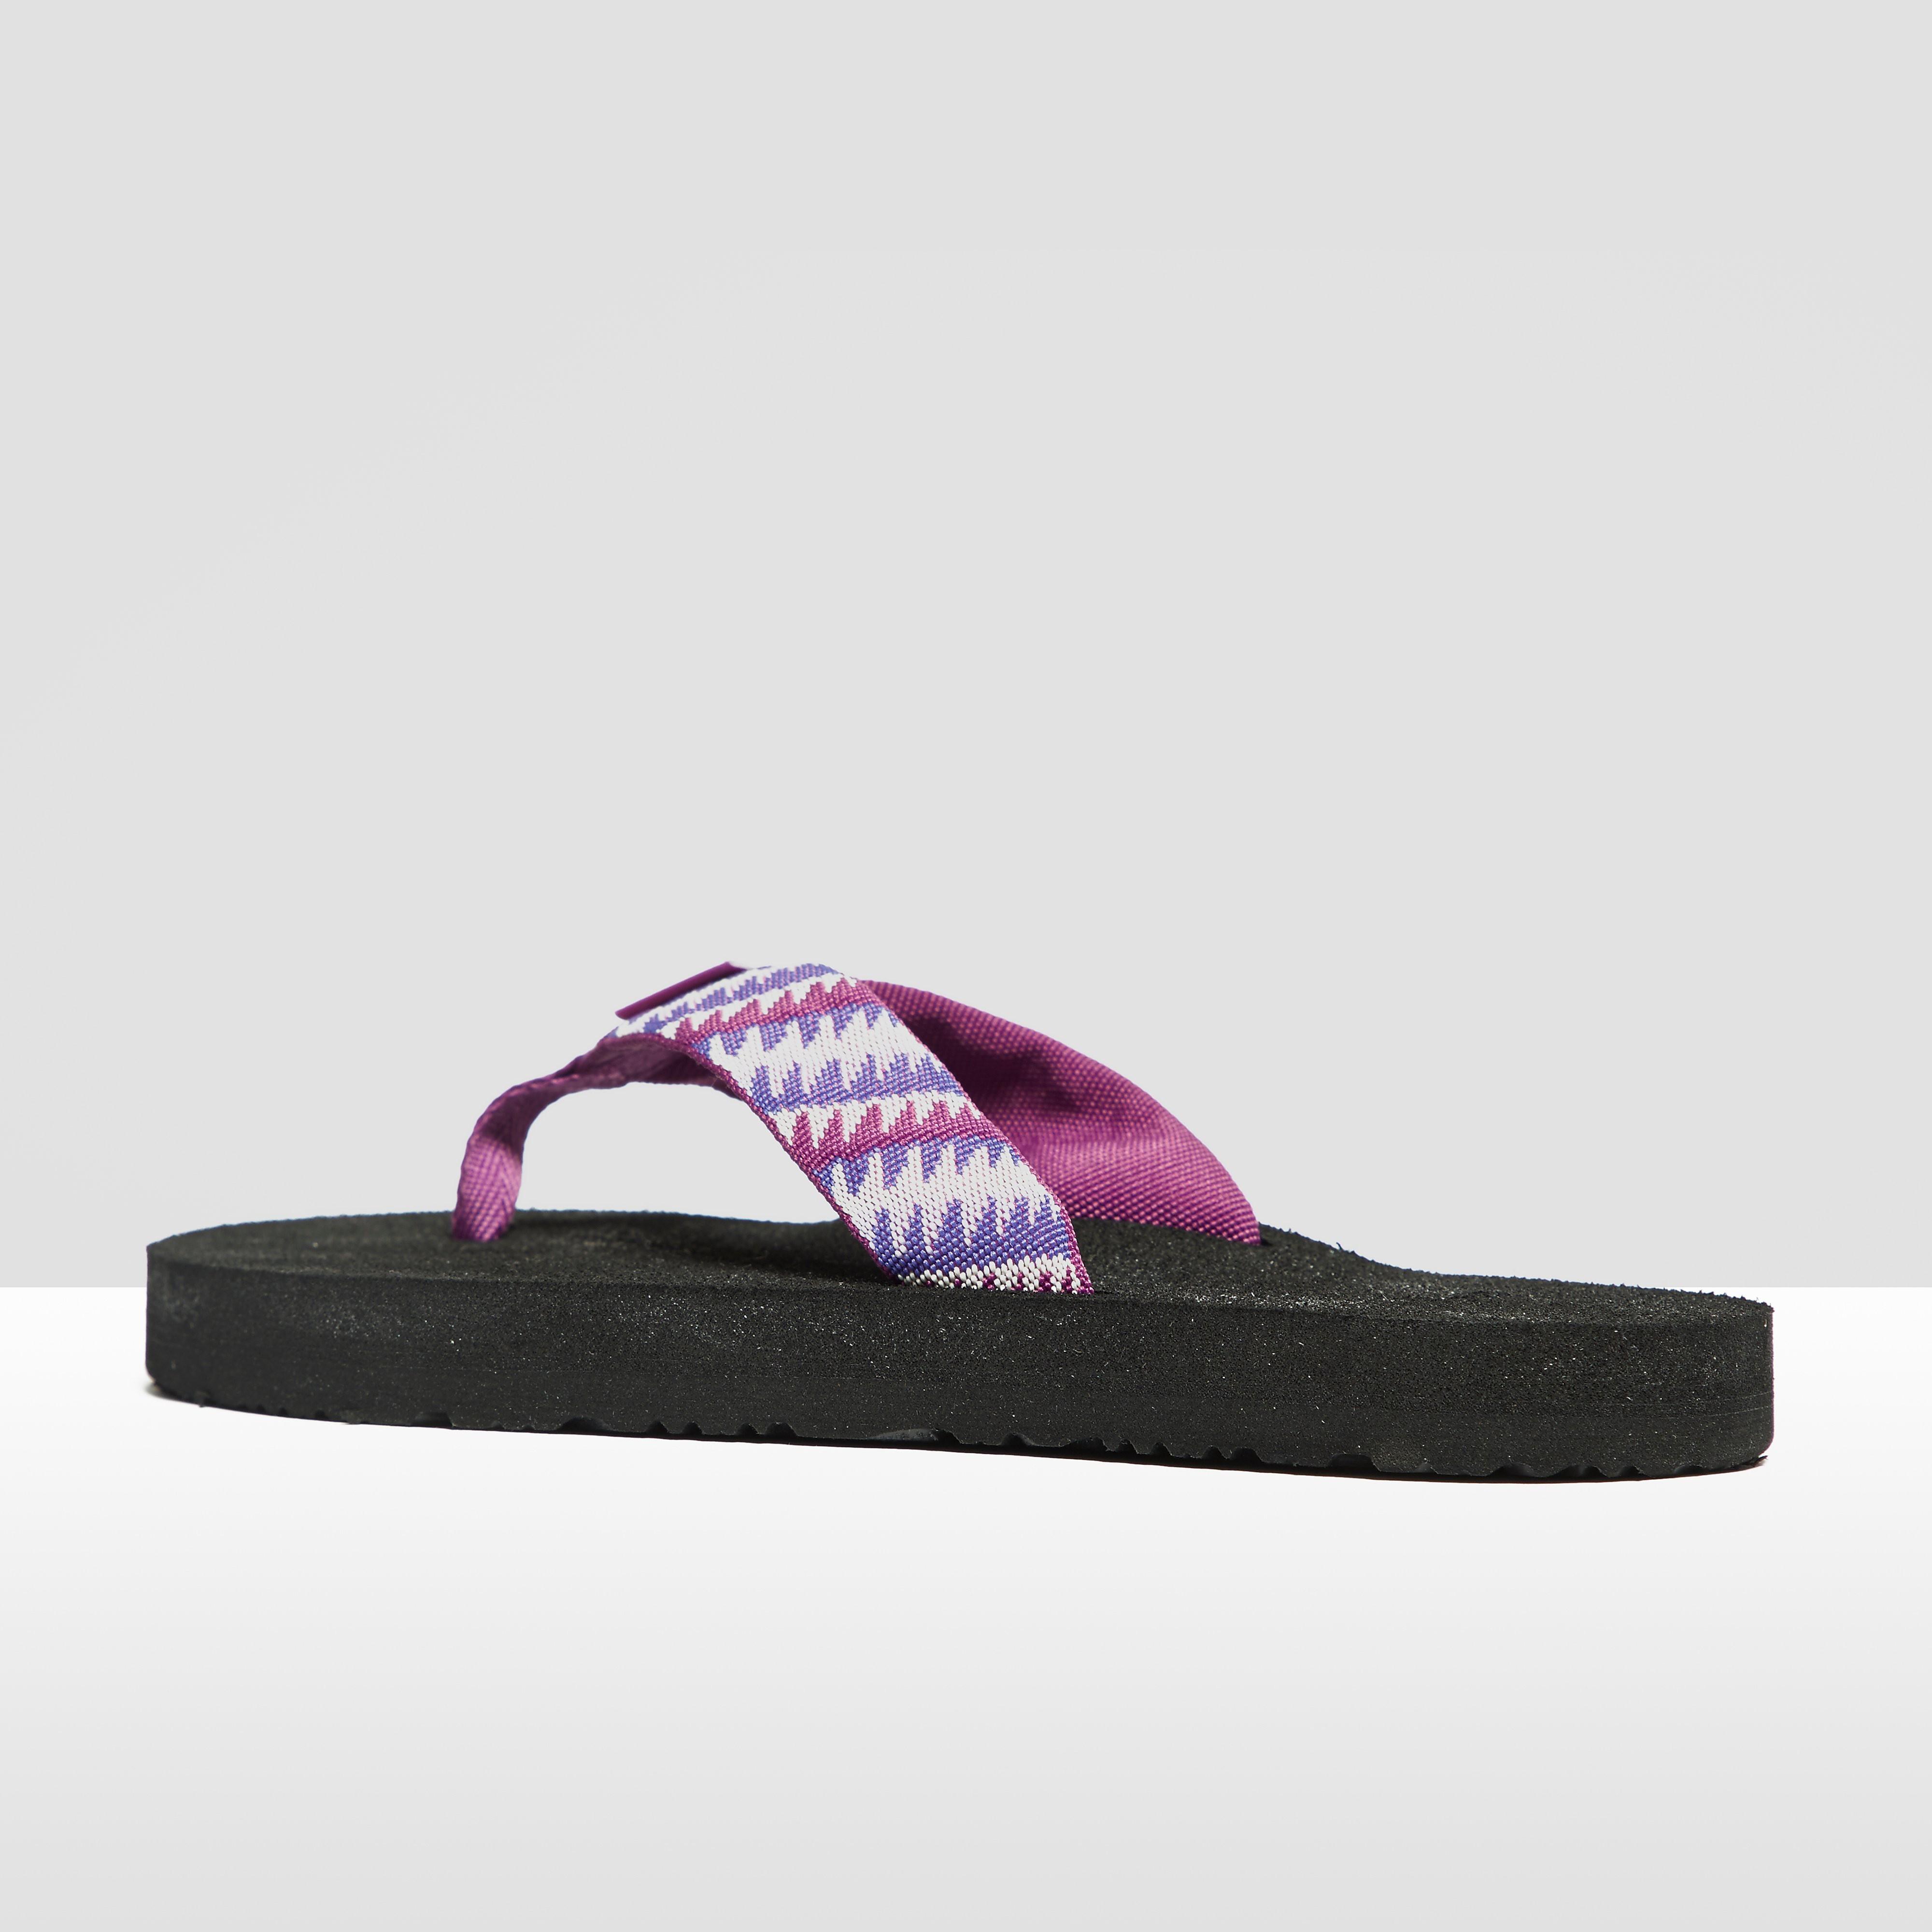 Teva Mush II Women's Sandals